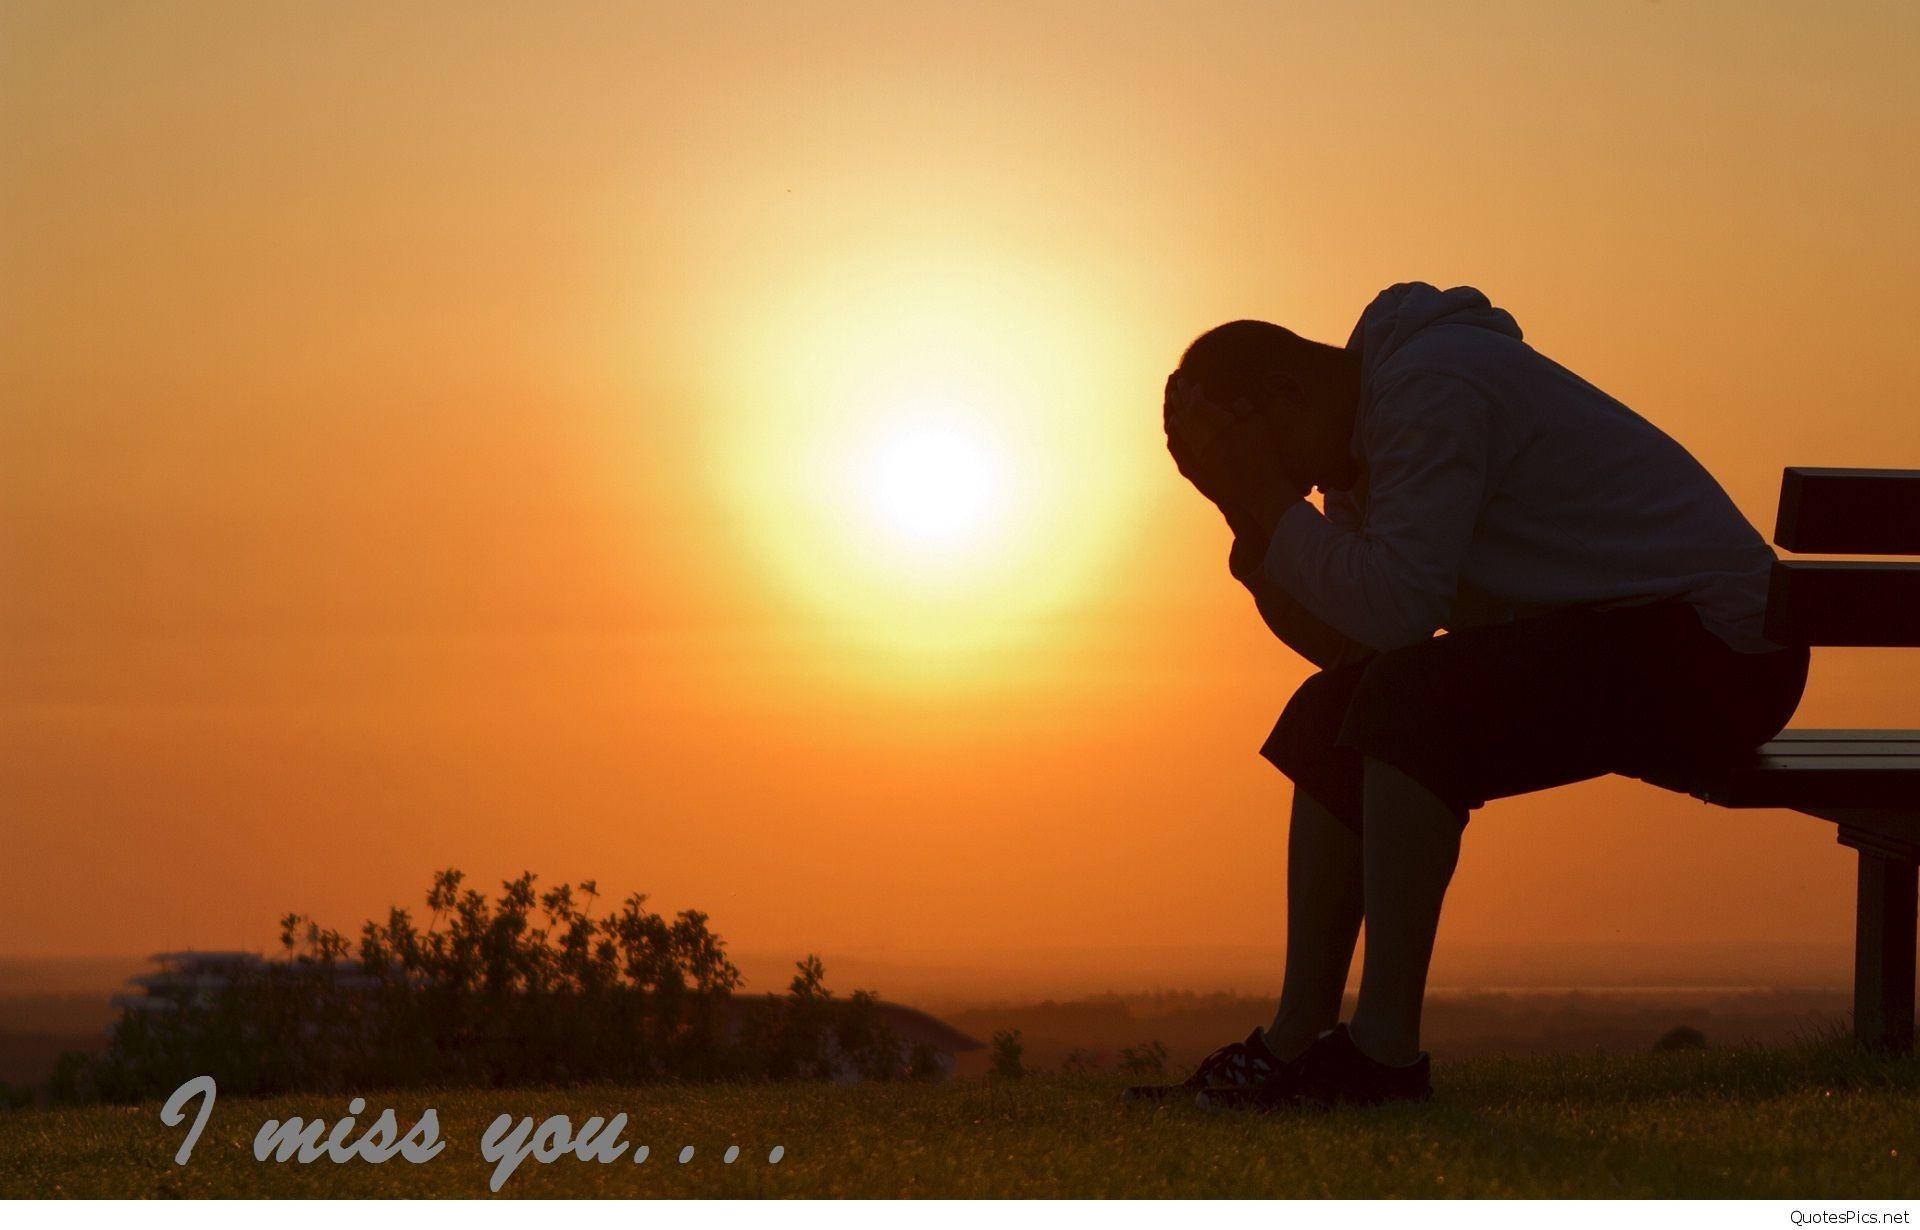 Miss You Sad Boy Hd 1920x1230 Download Hd Wallpaper Wallpapertip